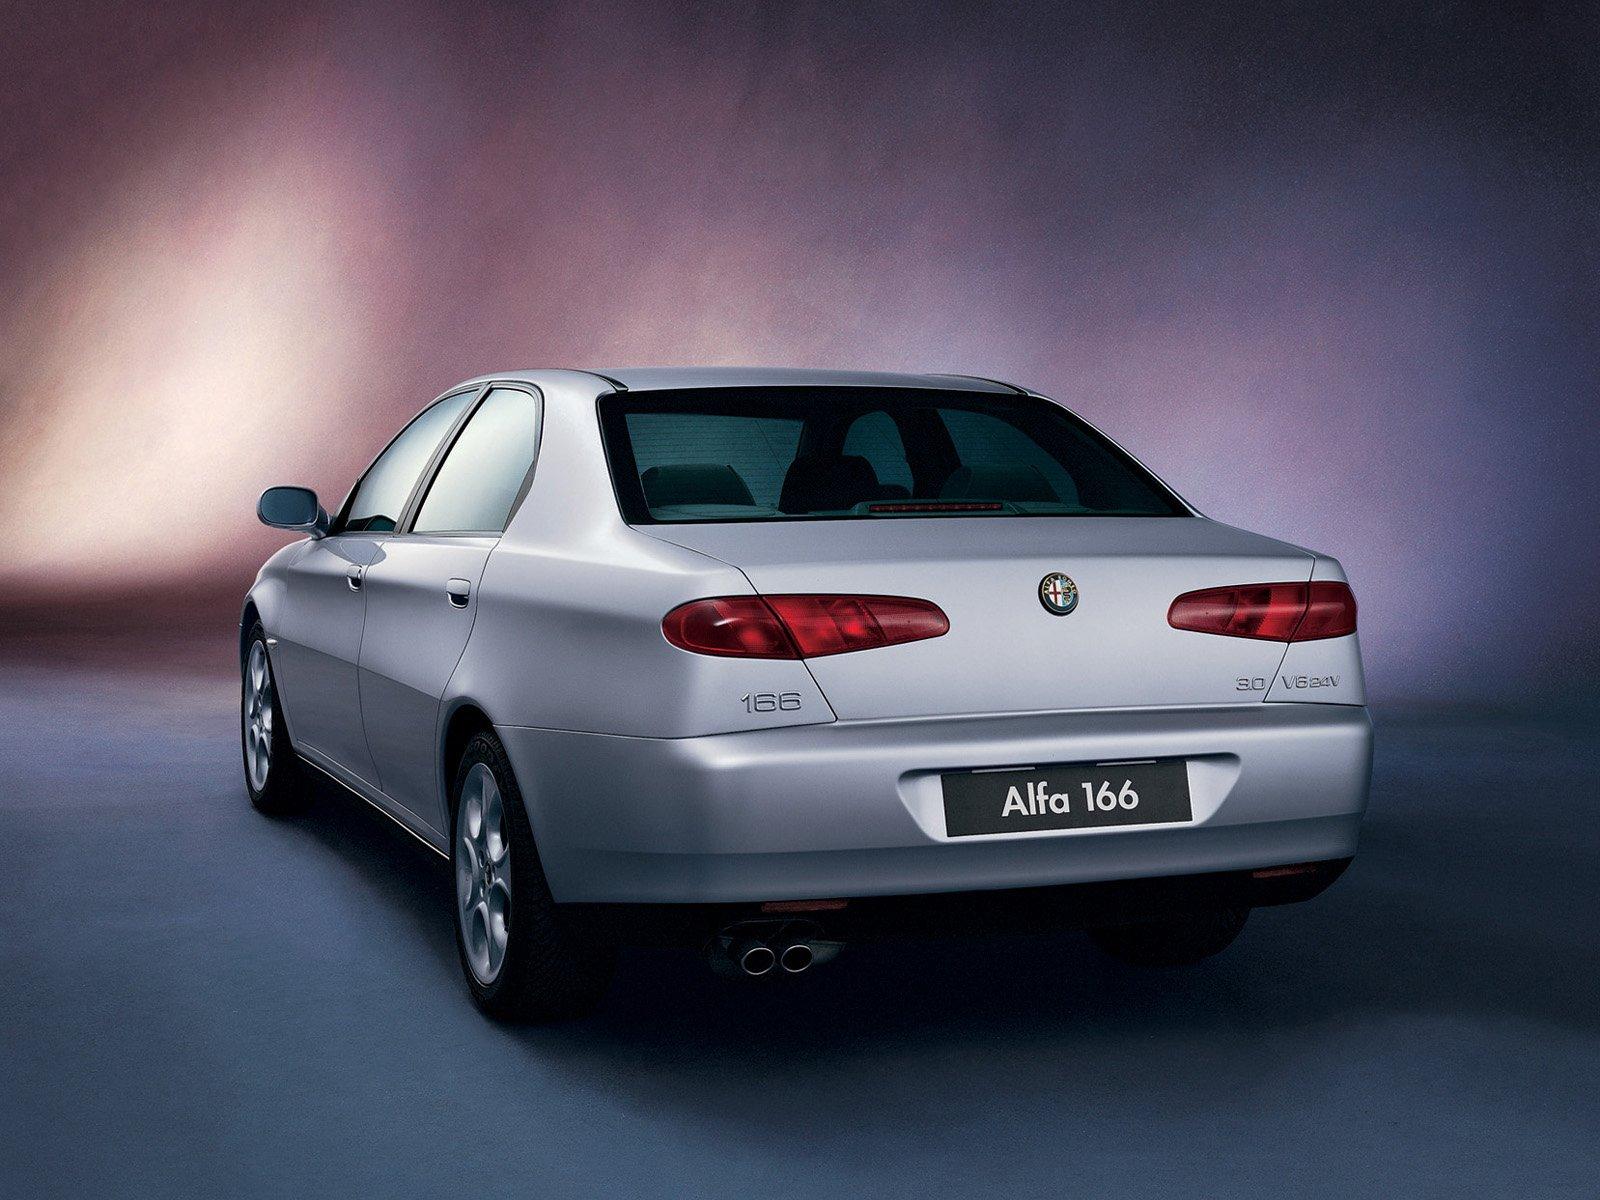 Alfa Romeo 166 - 1600 x 1200, 04 из 17